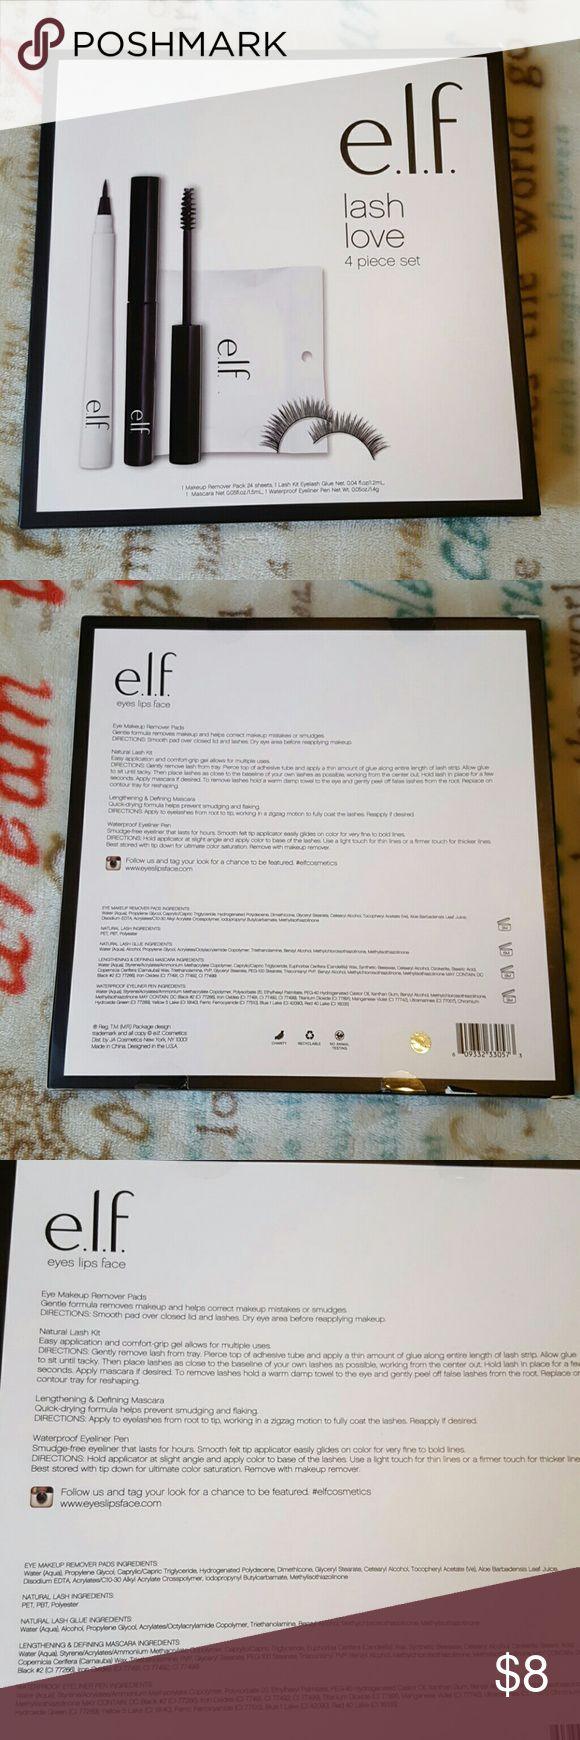 ELF lash love set 🆕 ELF lash love 4 piece set. Includes: Make up remover pads (24 ct), lashes with glue, waterproof eyeliner pen, lengthening and defining mascara. ELF Makeup